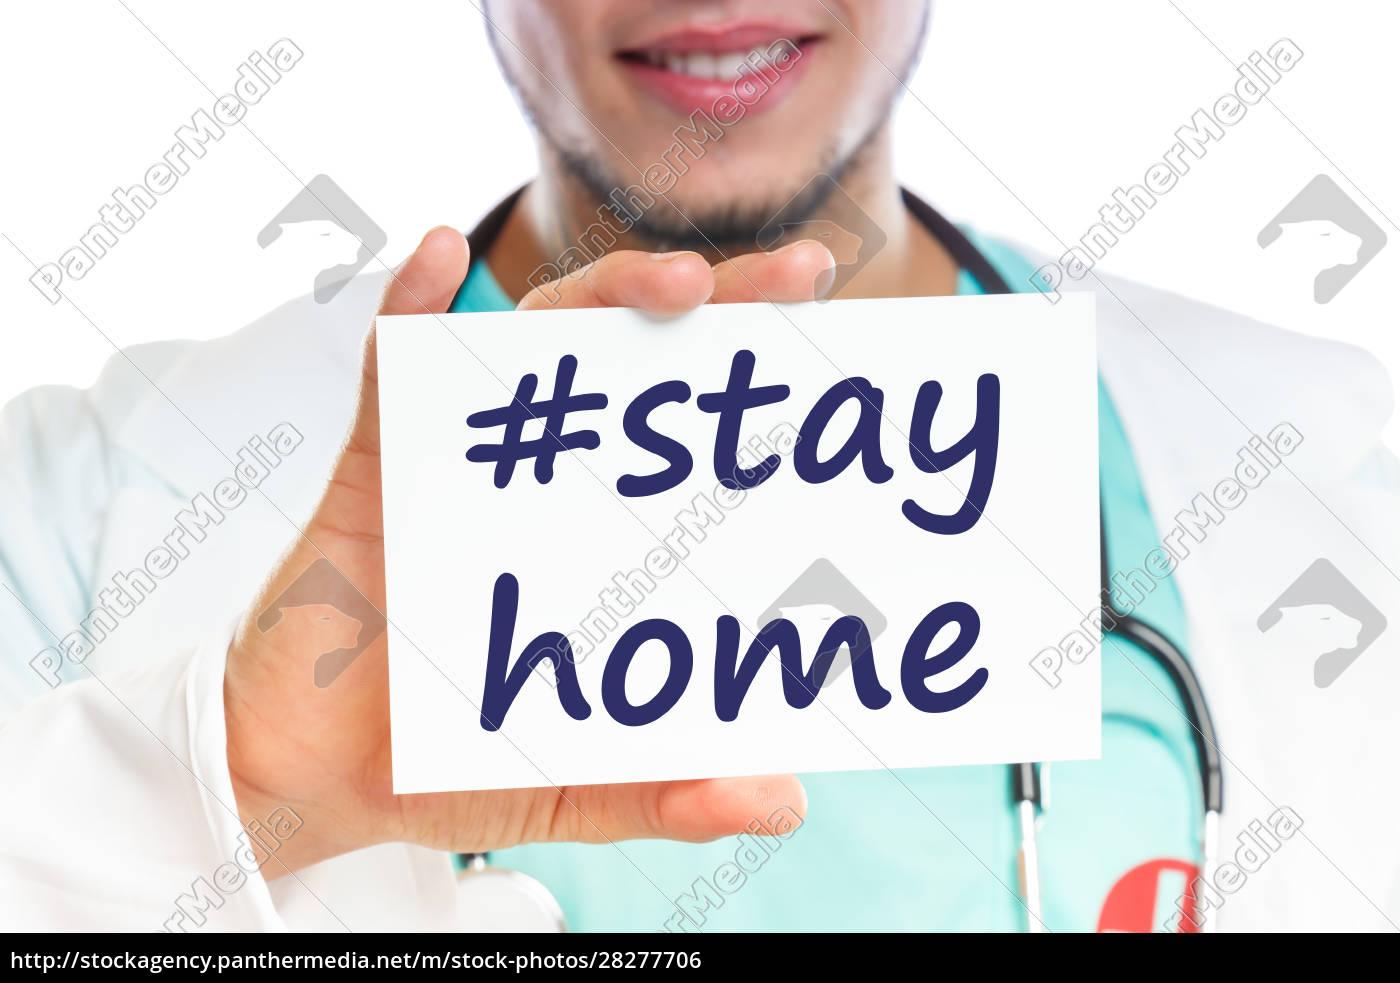 stay, home, hashtag, stayhome, corona, virus - 28277706